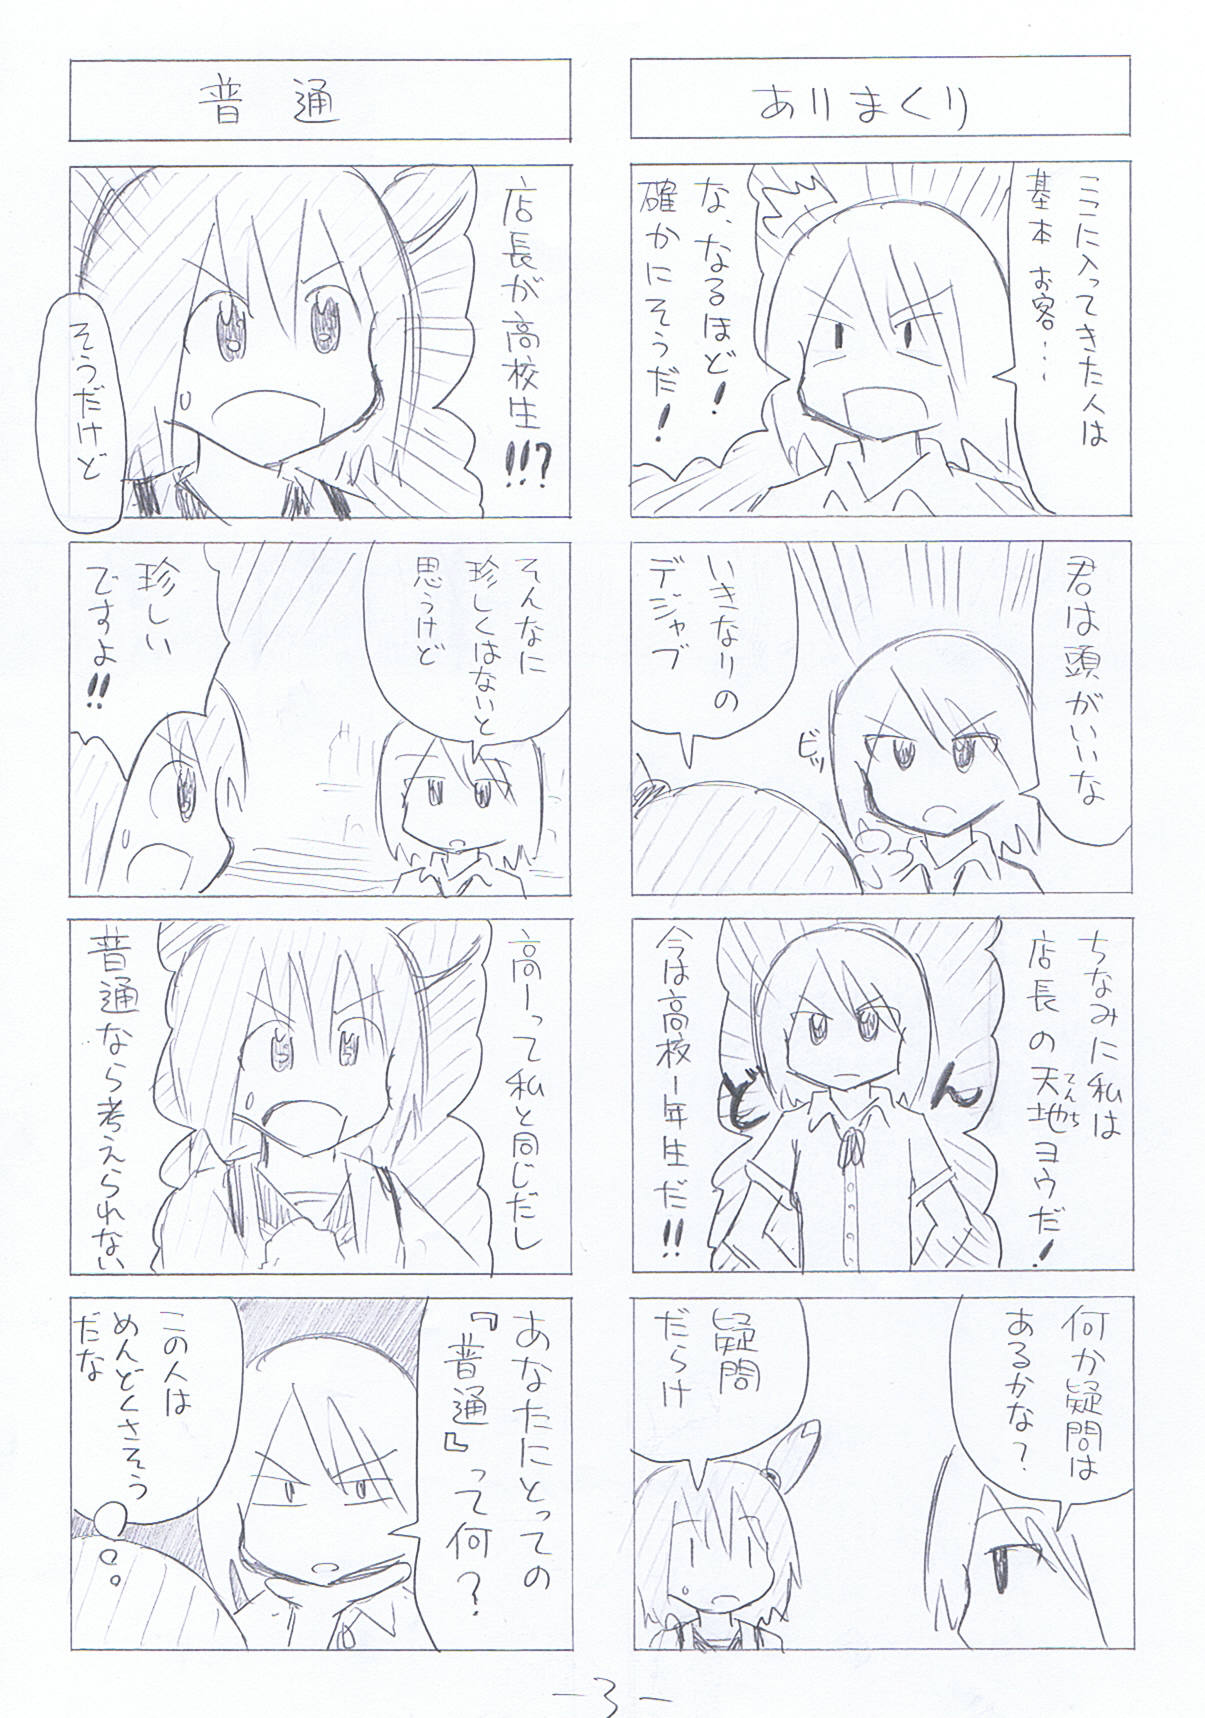 hitotoki-1-3.jpg